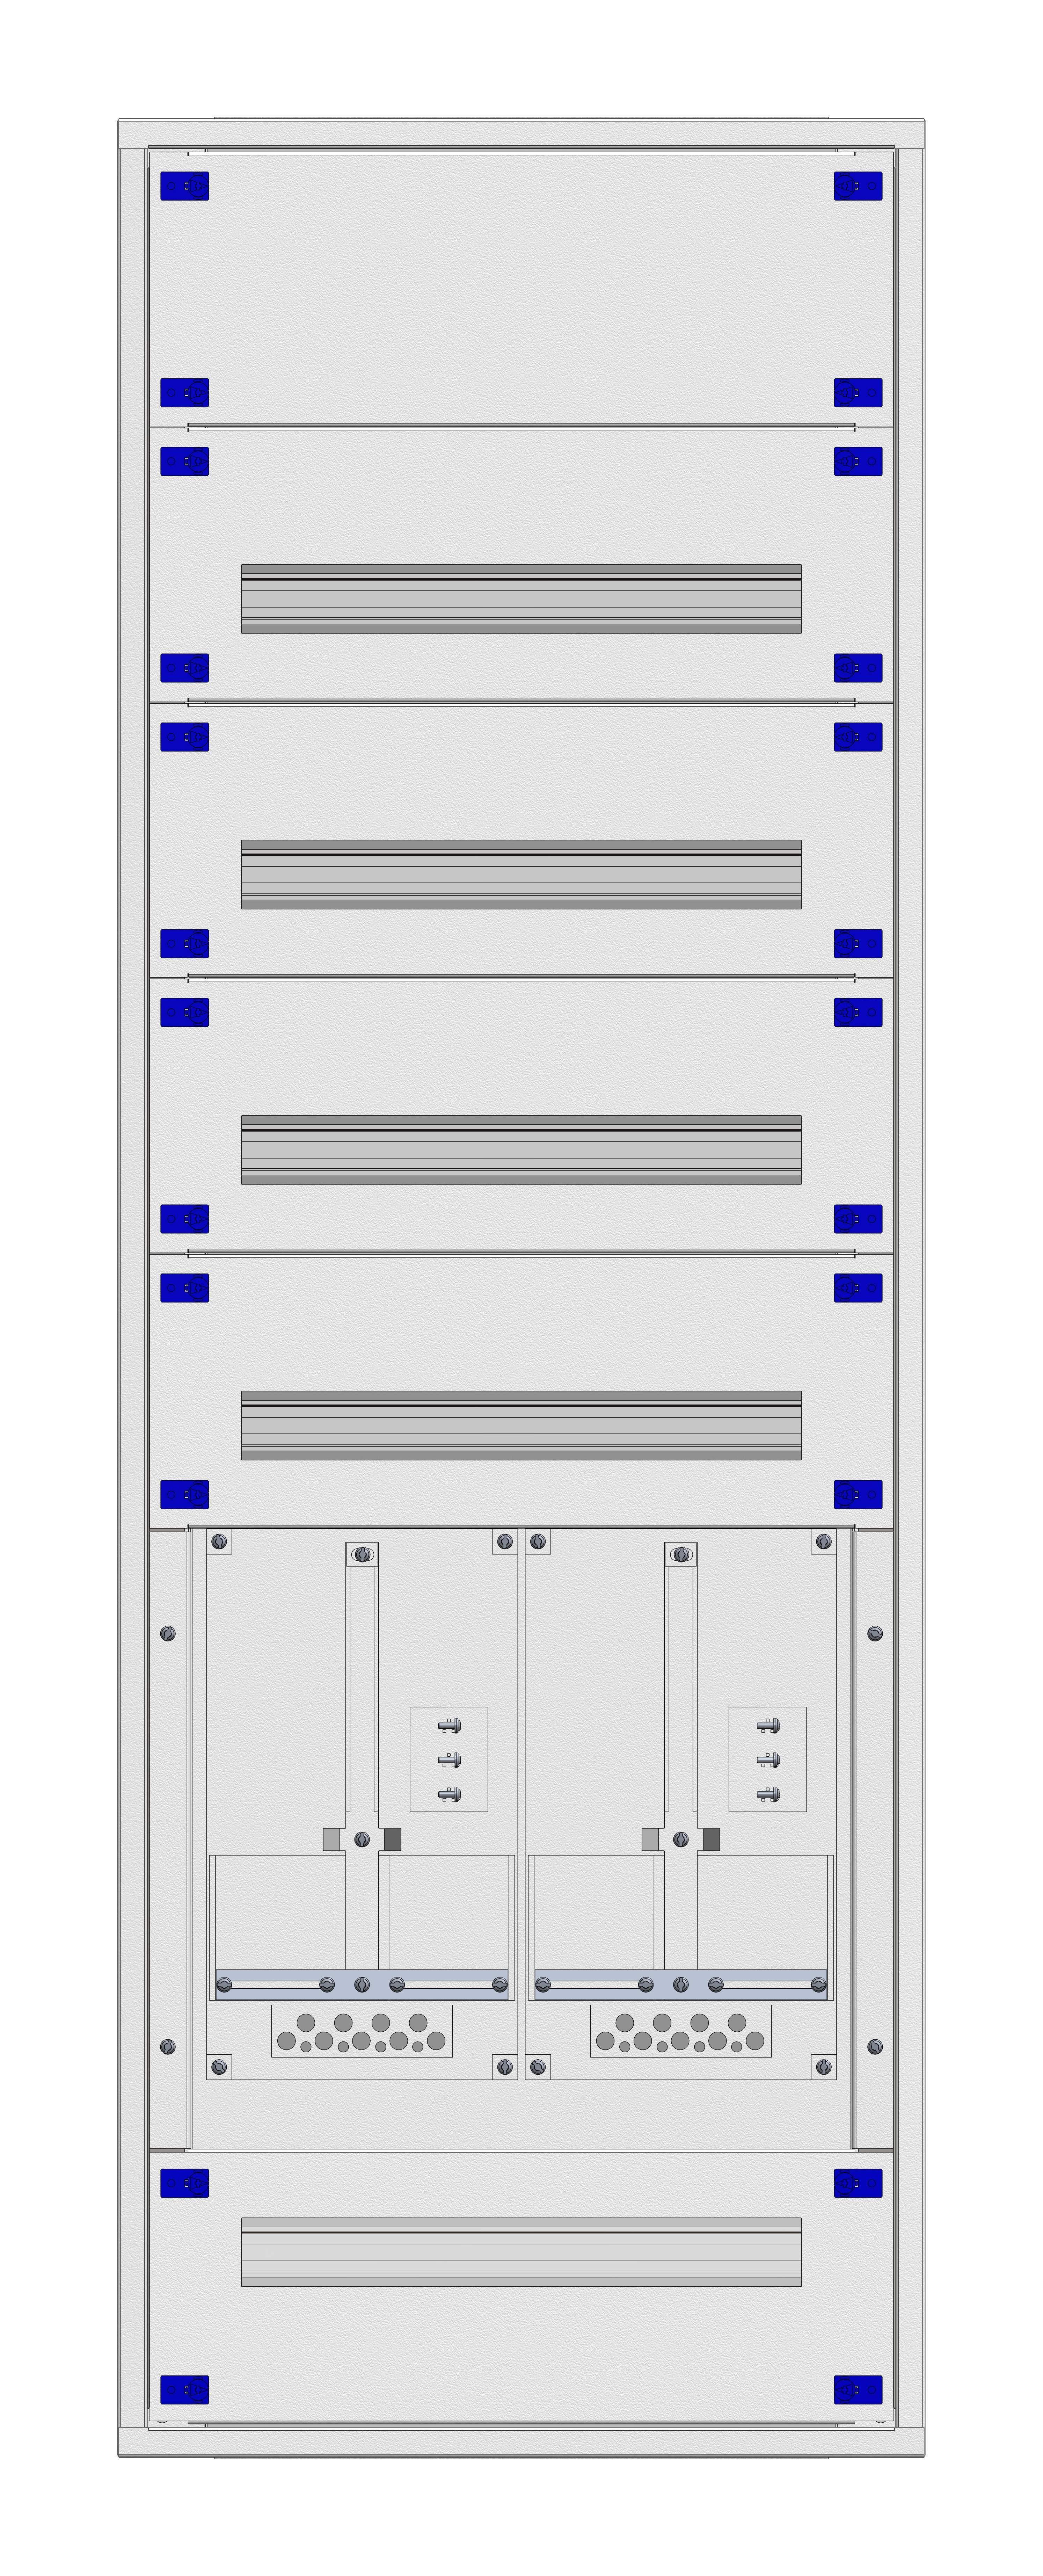 1 Stk Aufputz-Zählerverteiler 2A-33E/VBG 2ZP, H1605B590T250mm IL160233VS